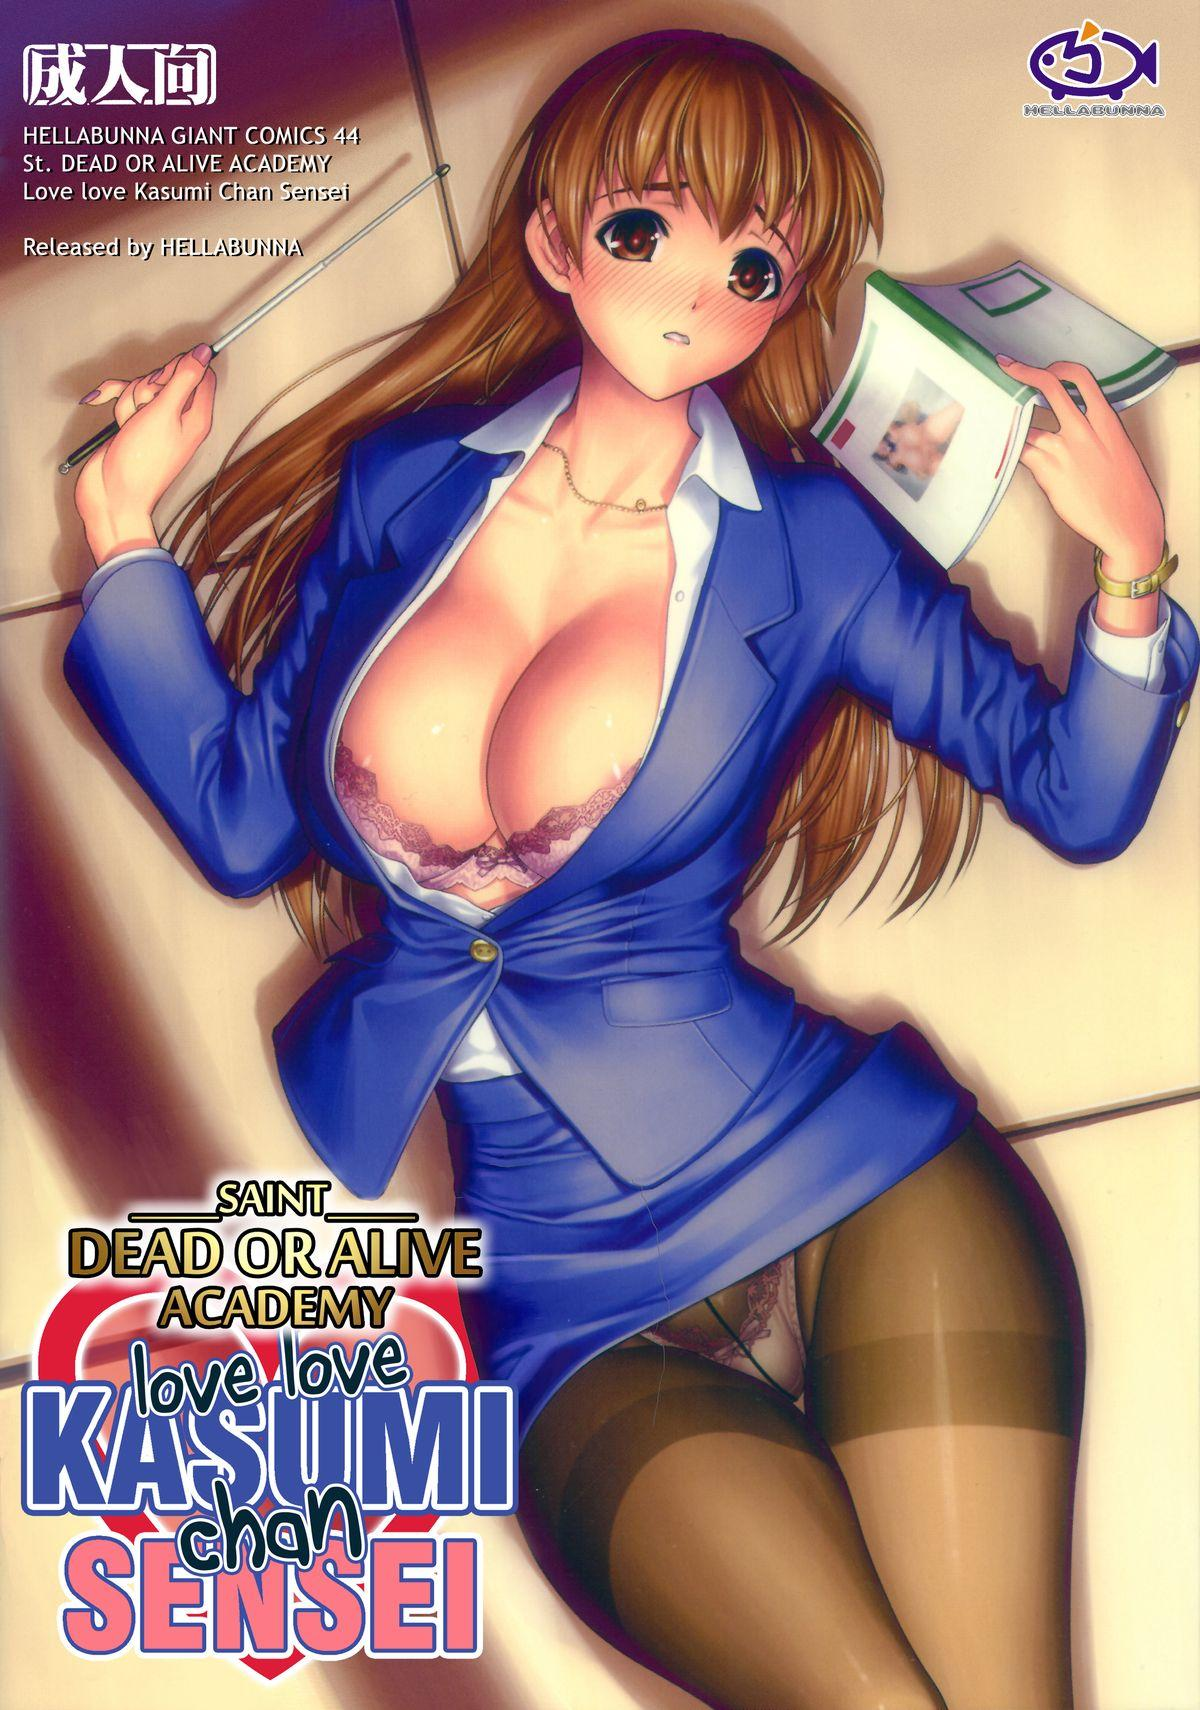 St. Dead or Alive Highschool - Love Love Kasumi Chan Teacher 0